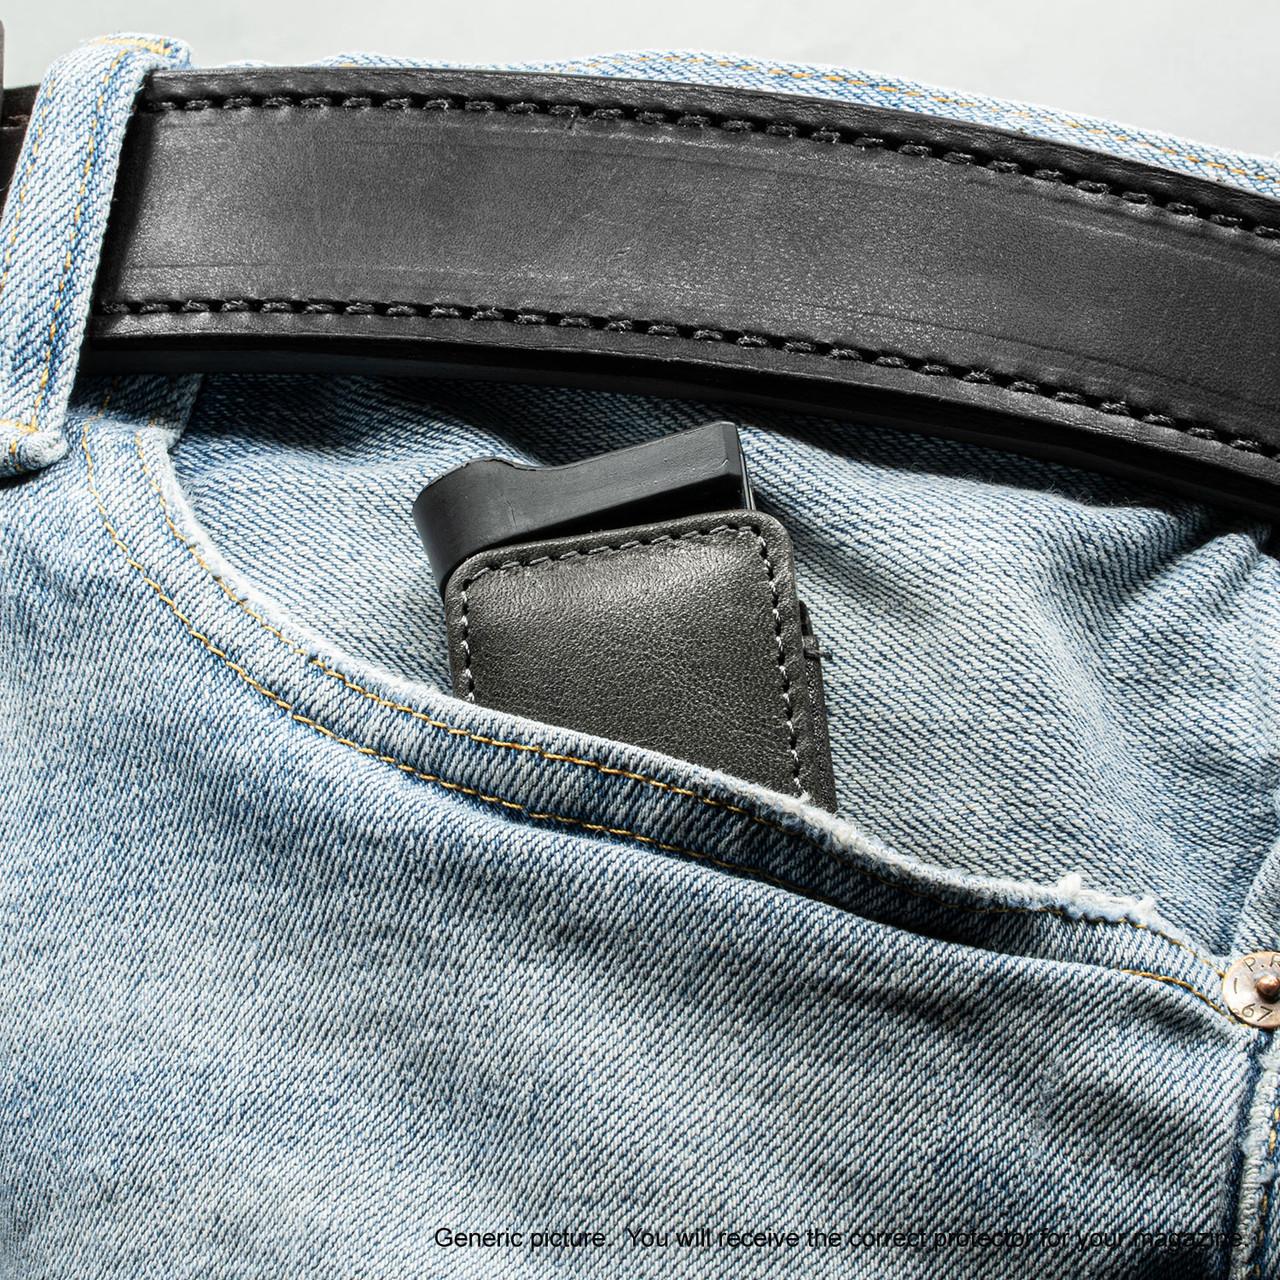 CZ 2075 Rami Black Freedom Magazine Pocket Protector